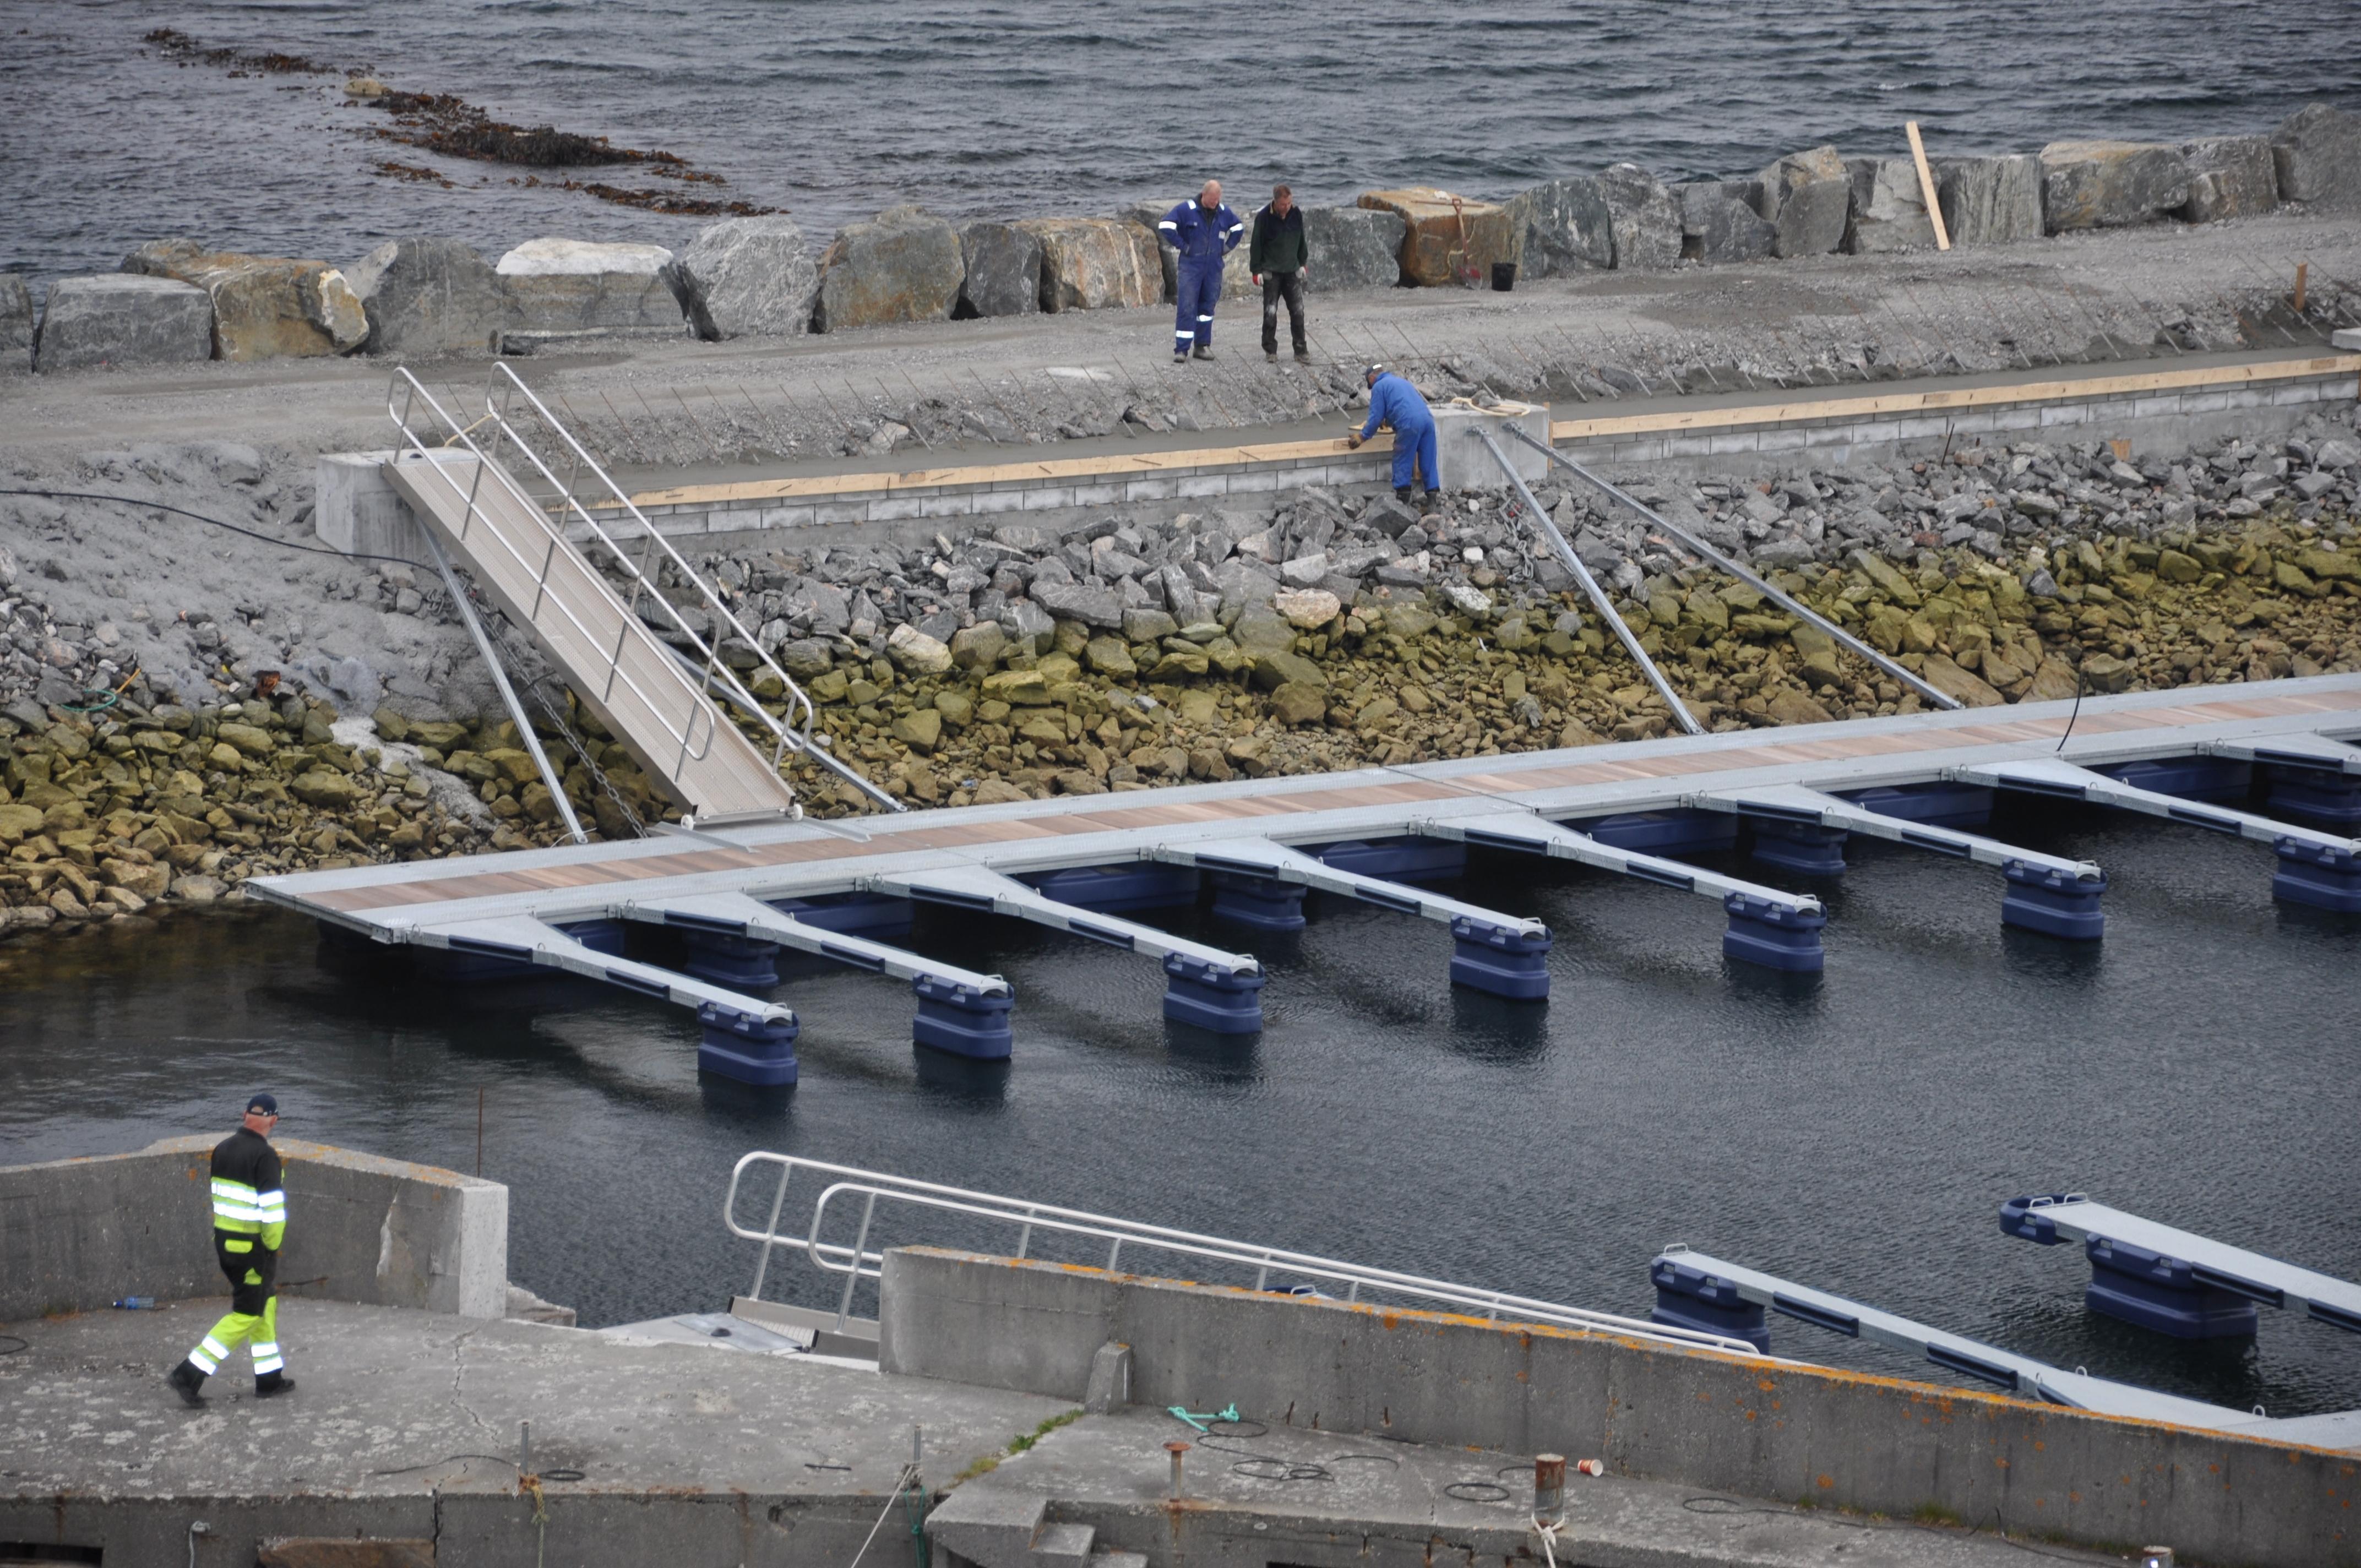 https://marinasolutions.no/uploads/Suløen-Båtforening_Dugnad.JPG